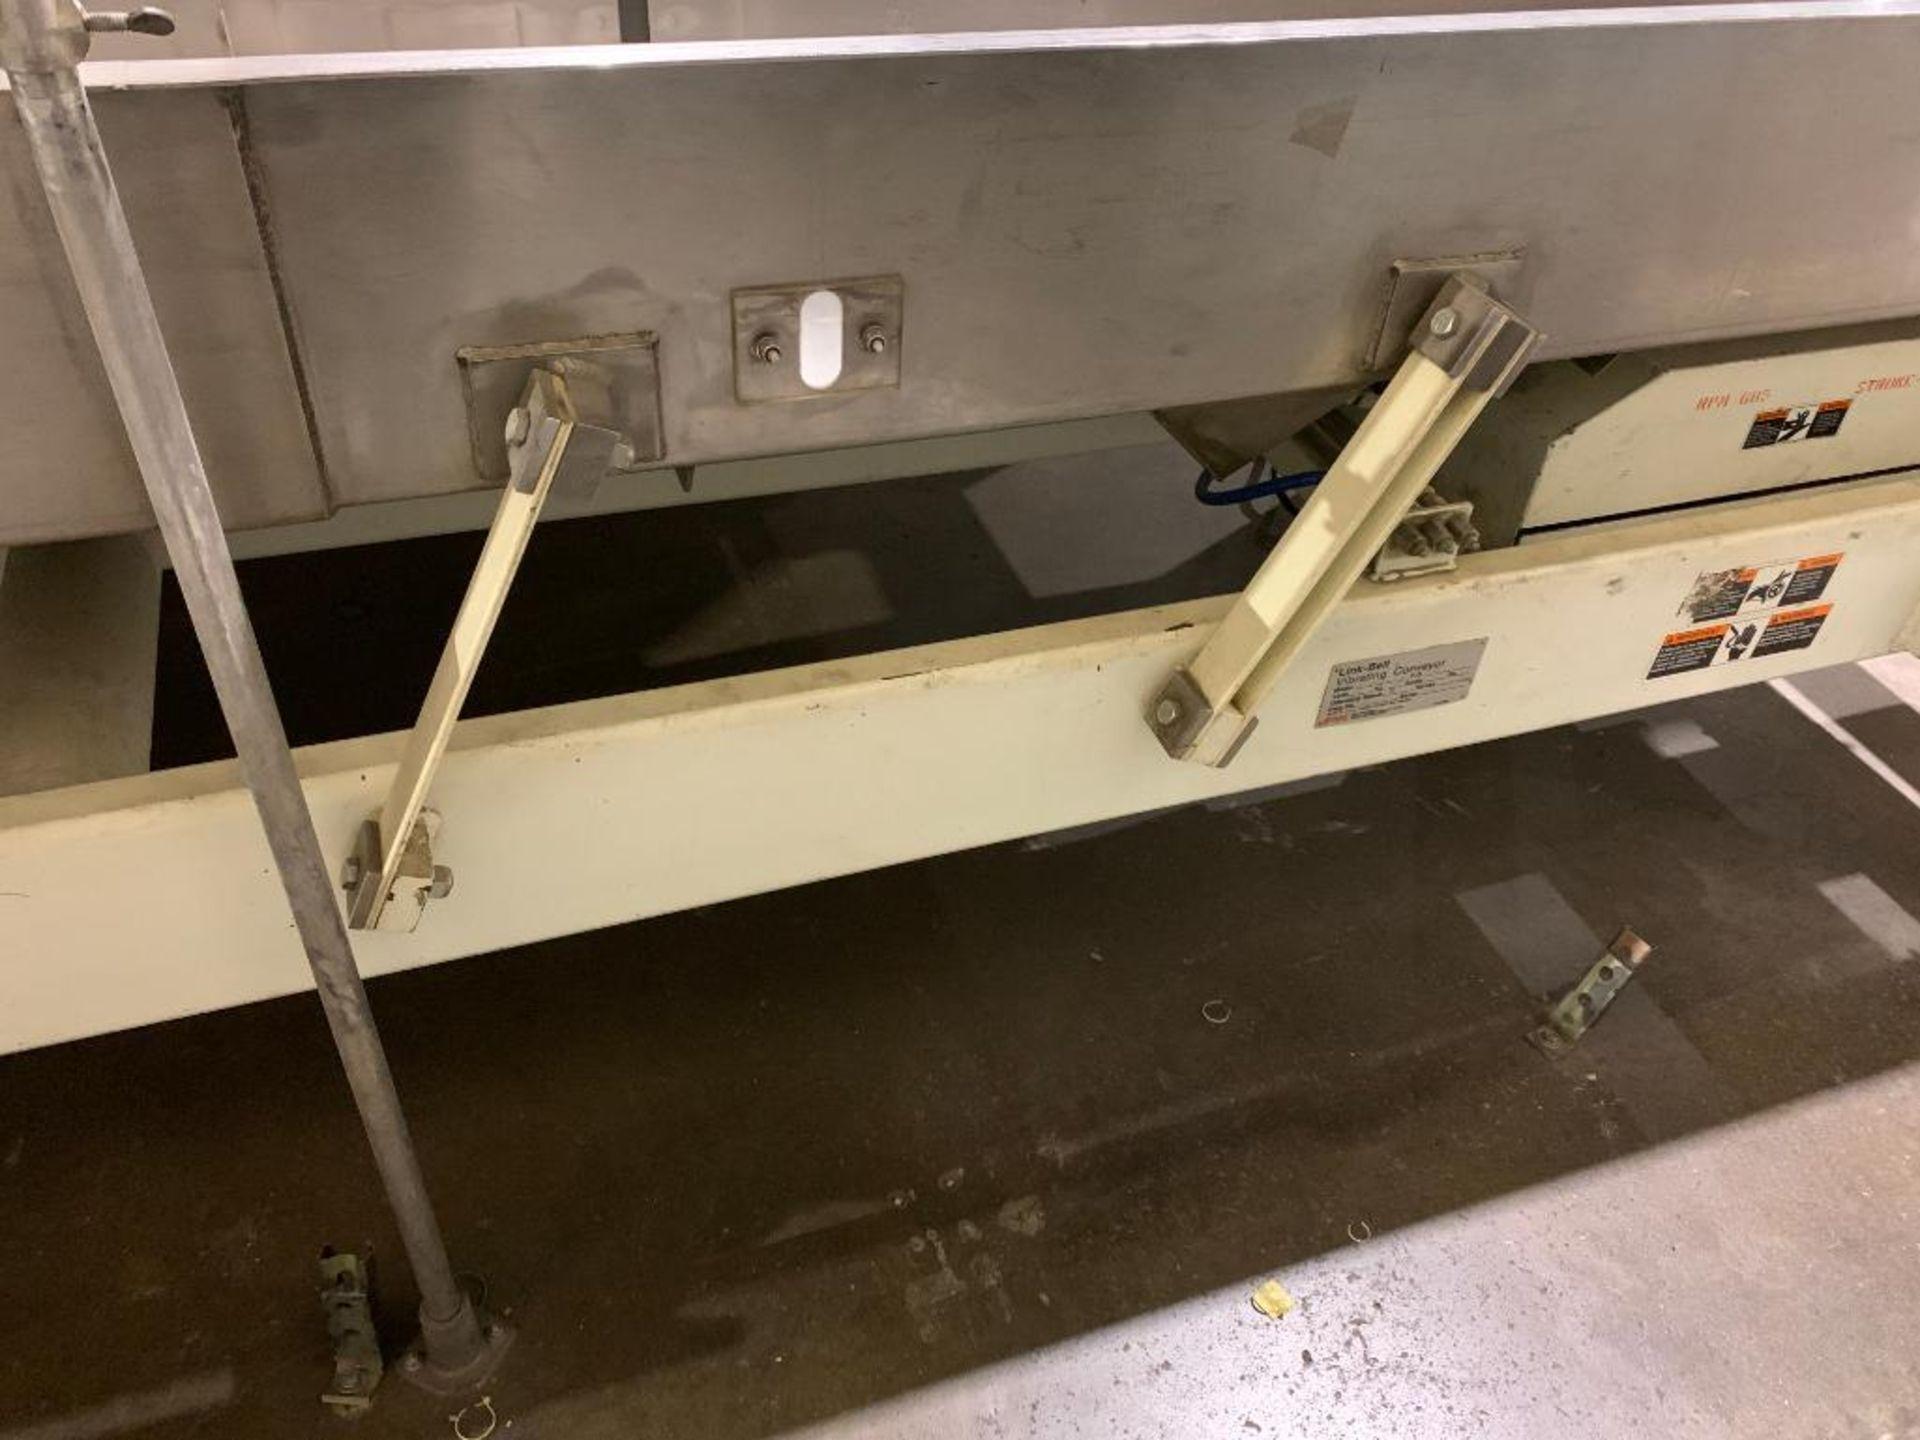 1992 Link-Belt vibratory conveyor, model LBL2405-10X12-10 - Image 7 of 34